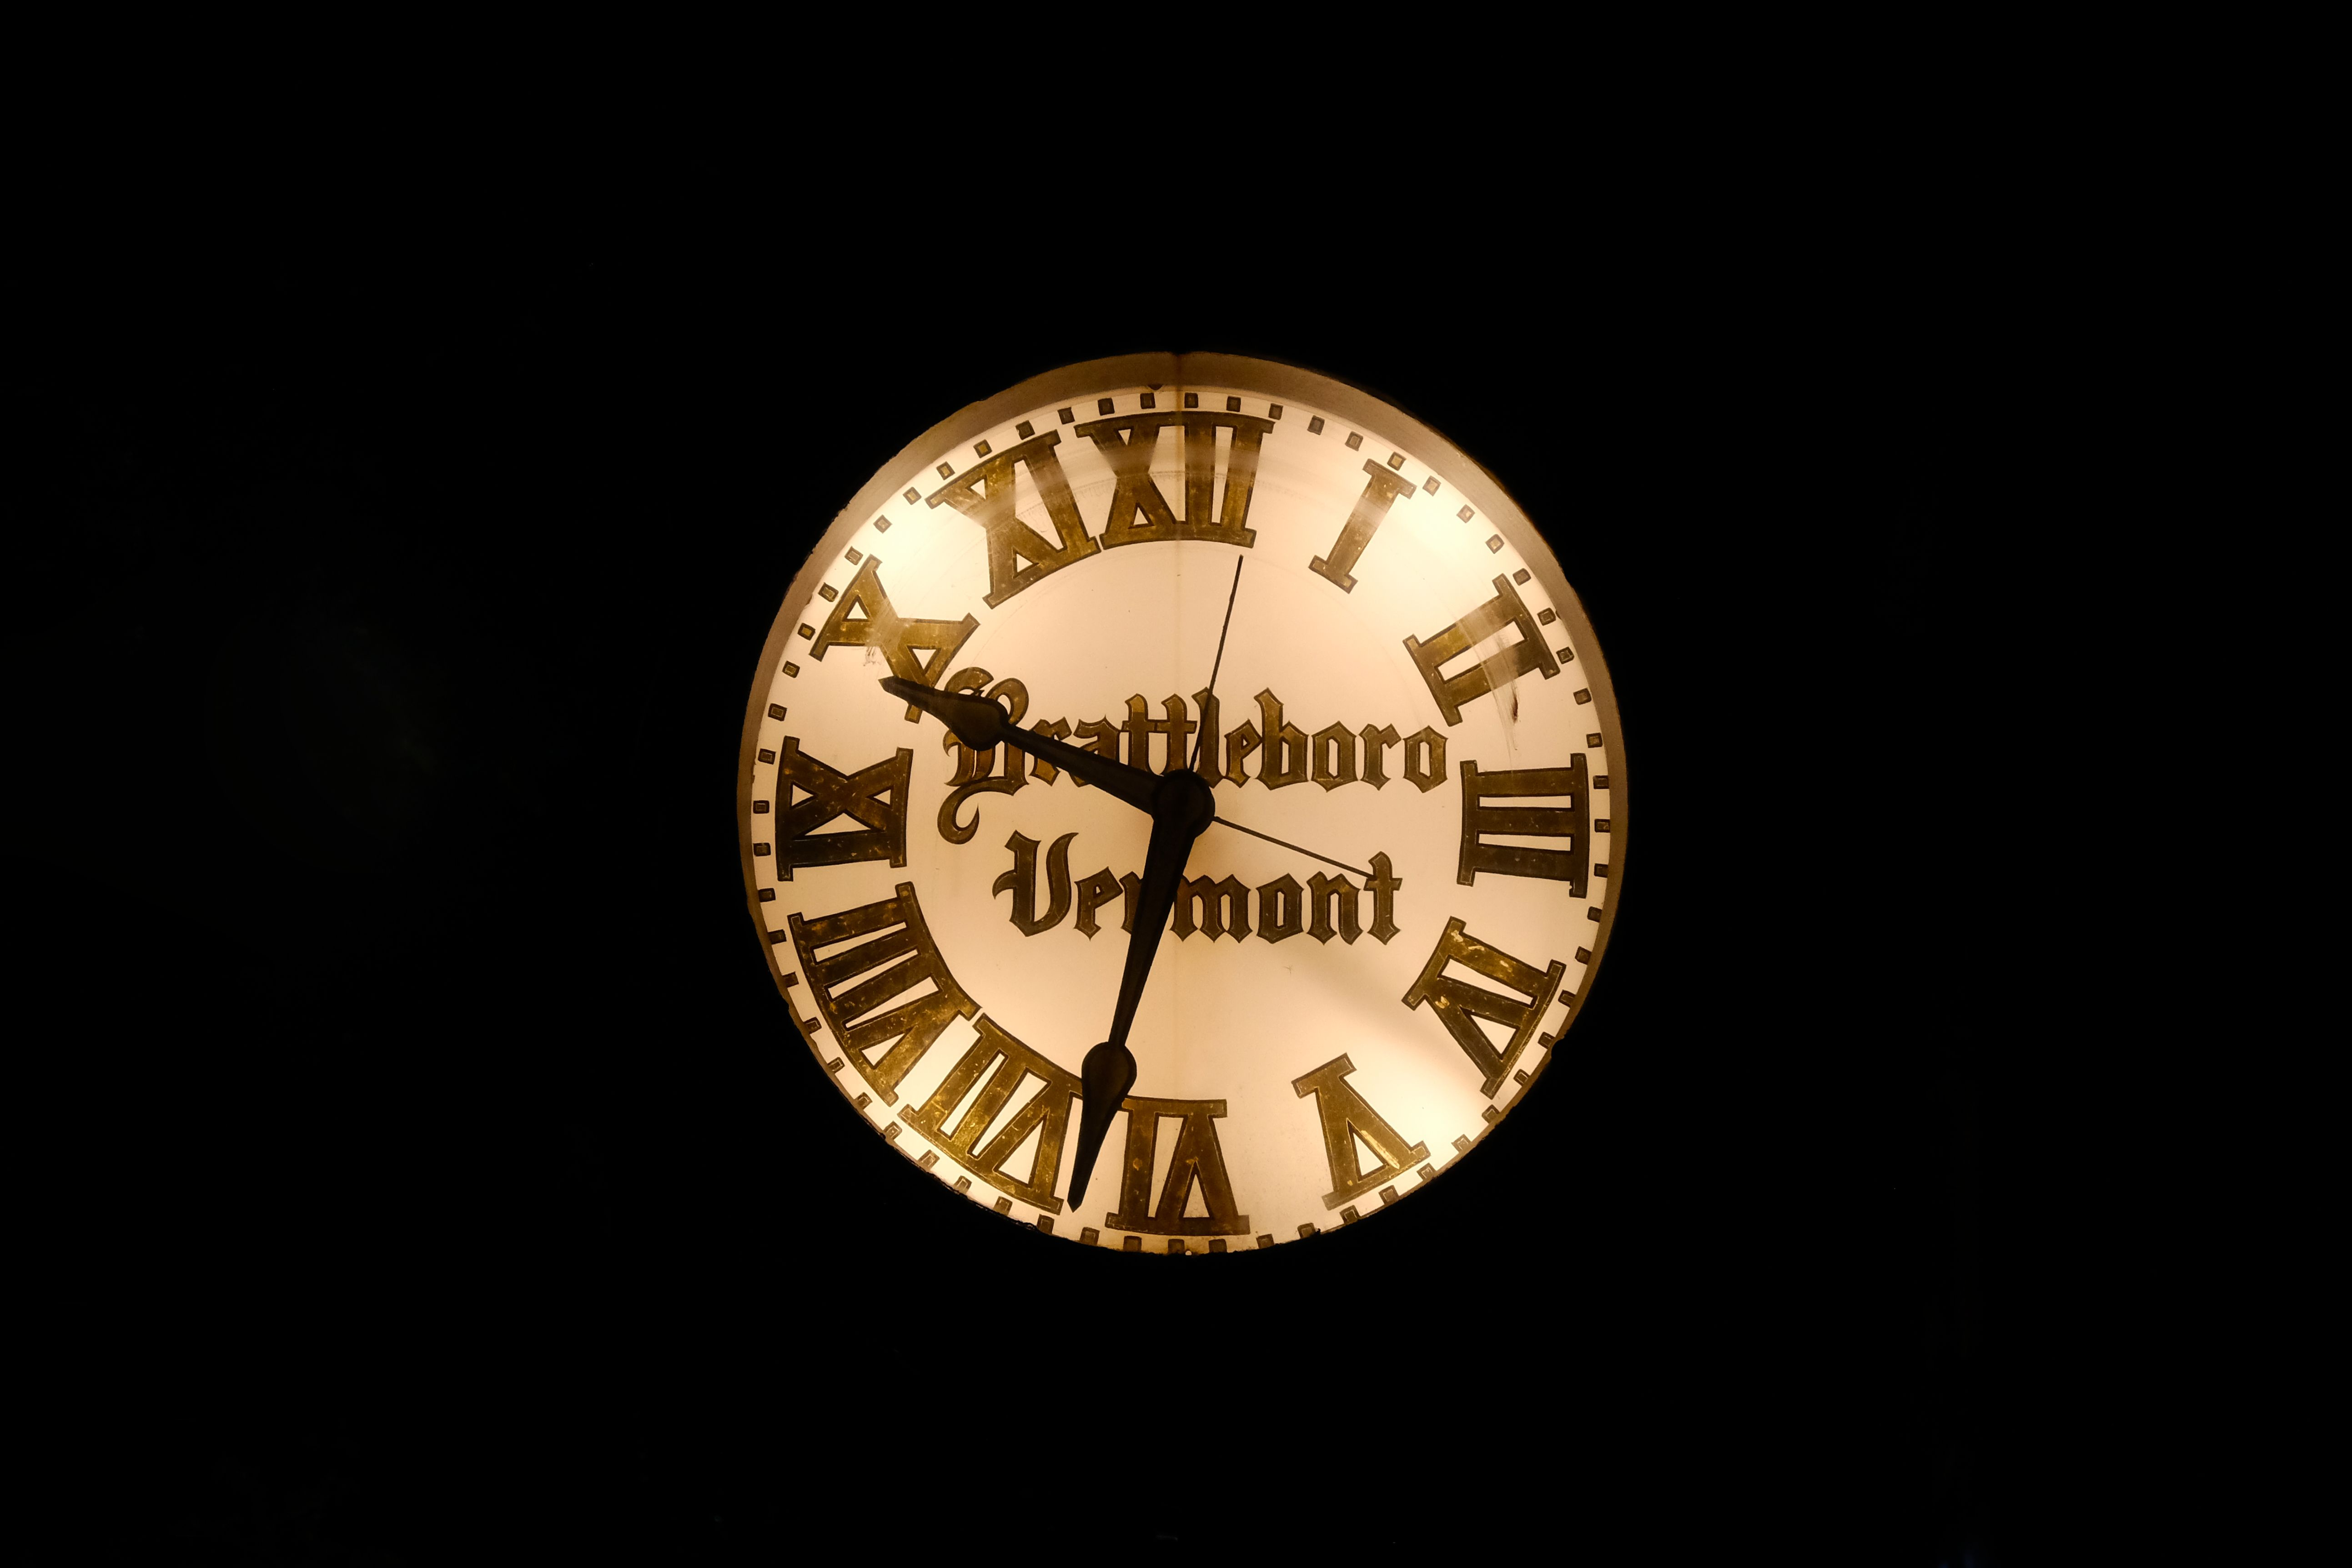 Le Chameau Bleu - Blog Voyage Brattleboro Vermont - Horloge de Brattleboro